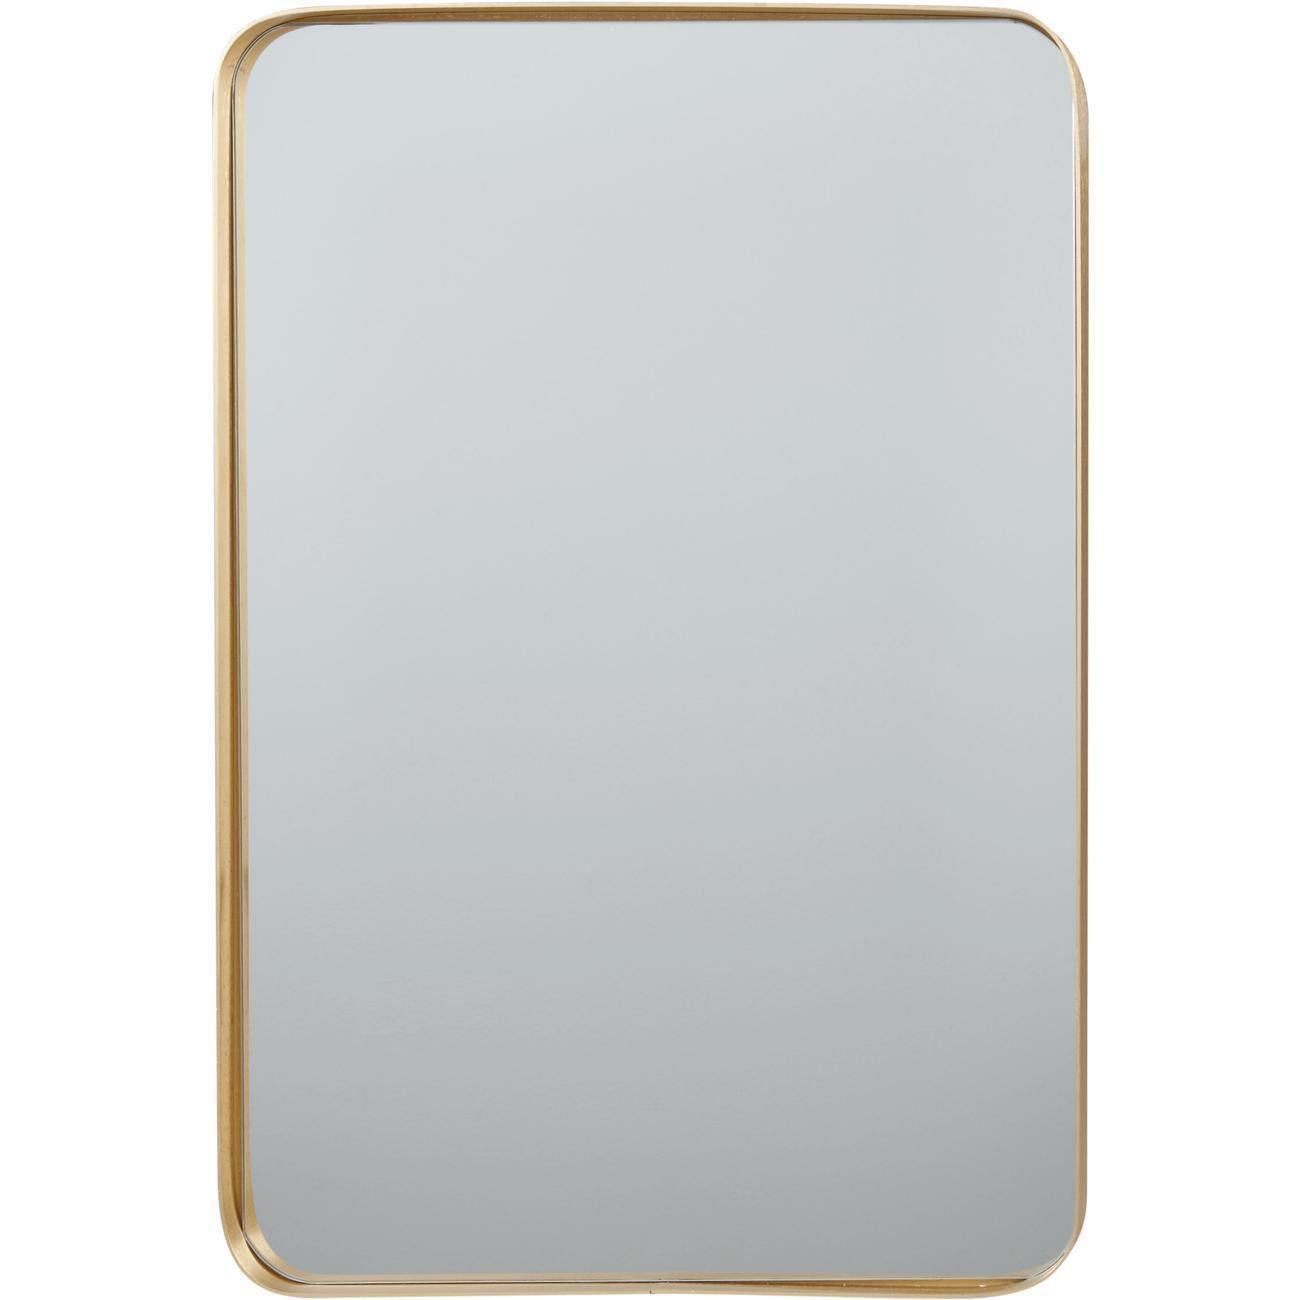 Miroir et tendance de forme rectangulairee en aluminium Traun1